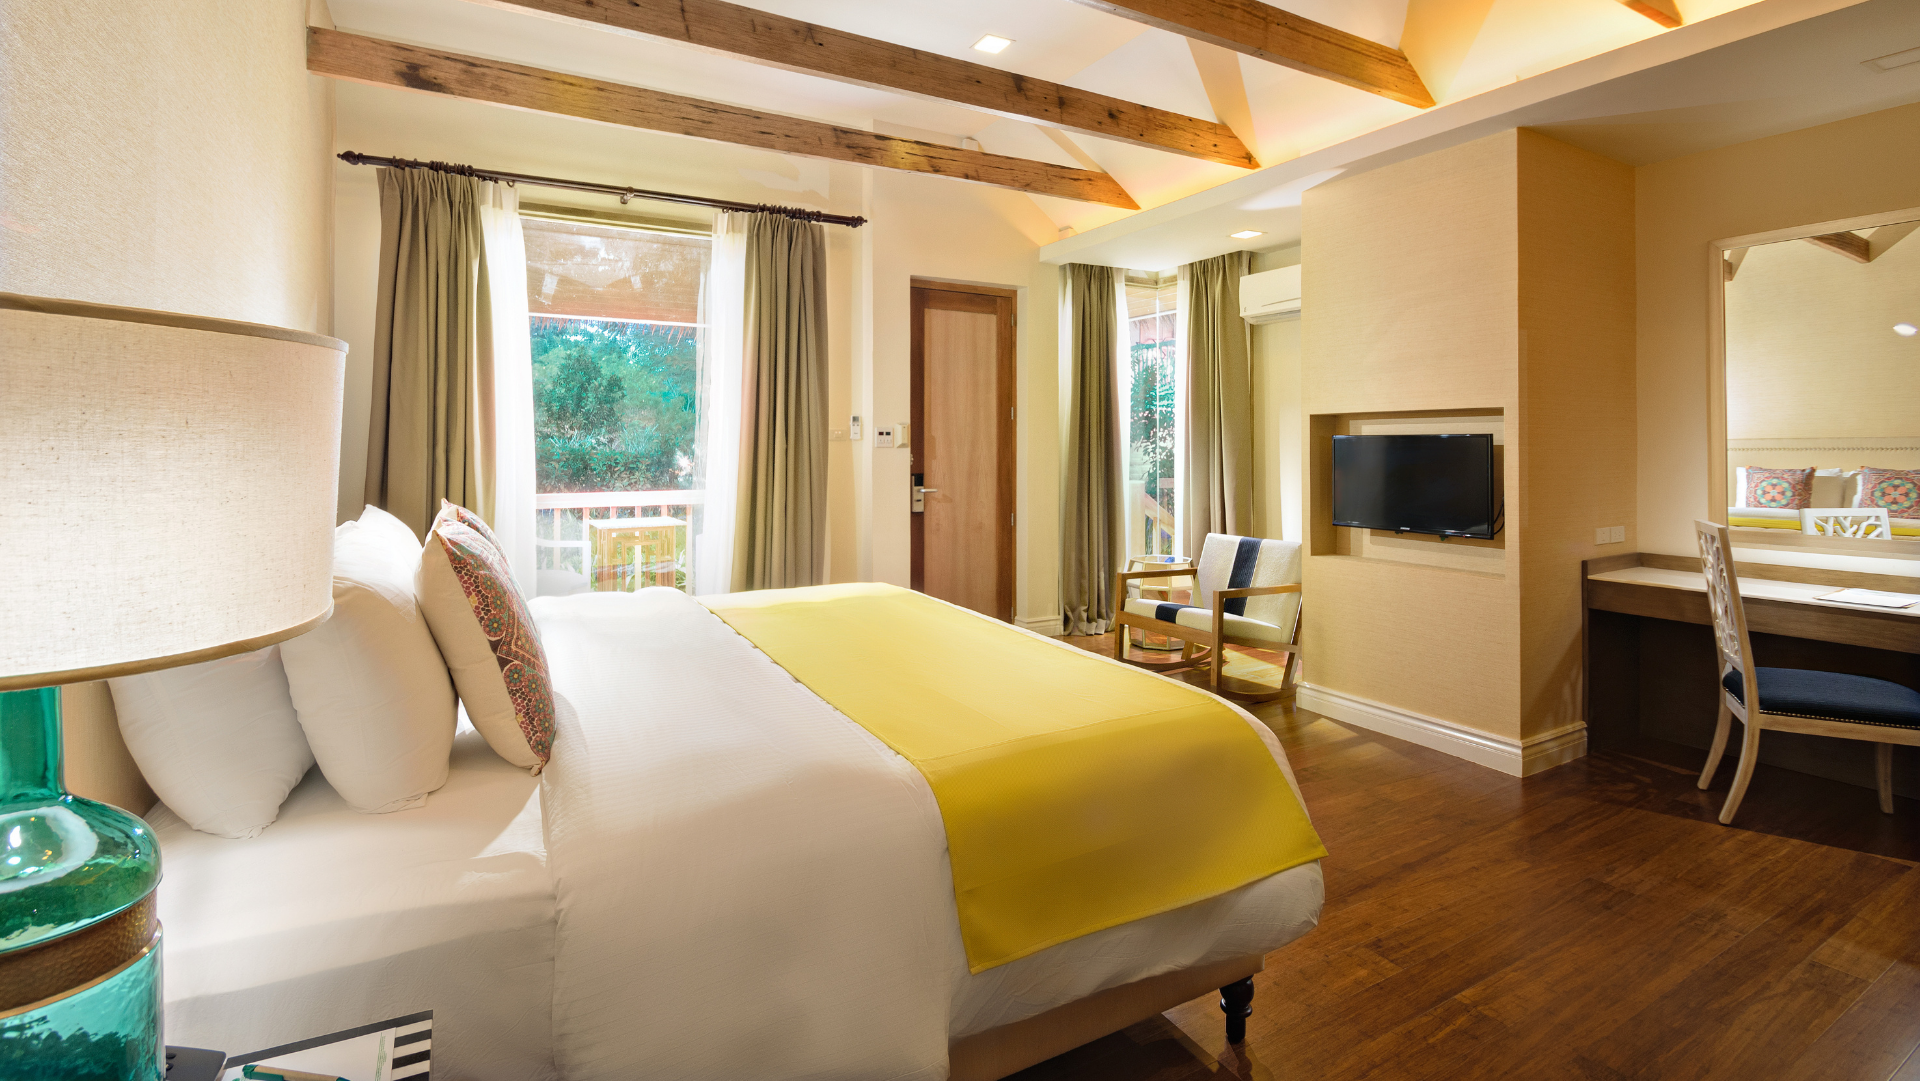 Deluxe bedroom in Mithi Resort and Spa in Bohol